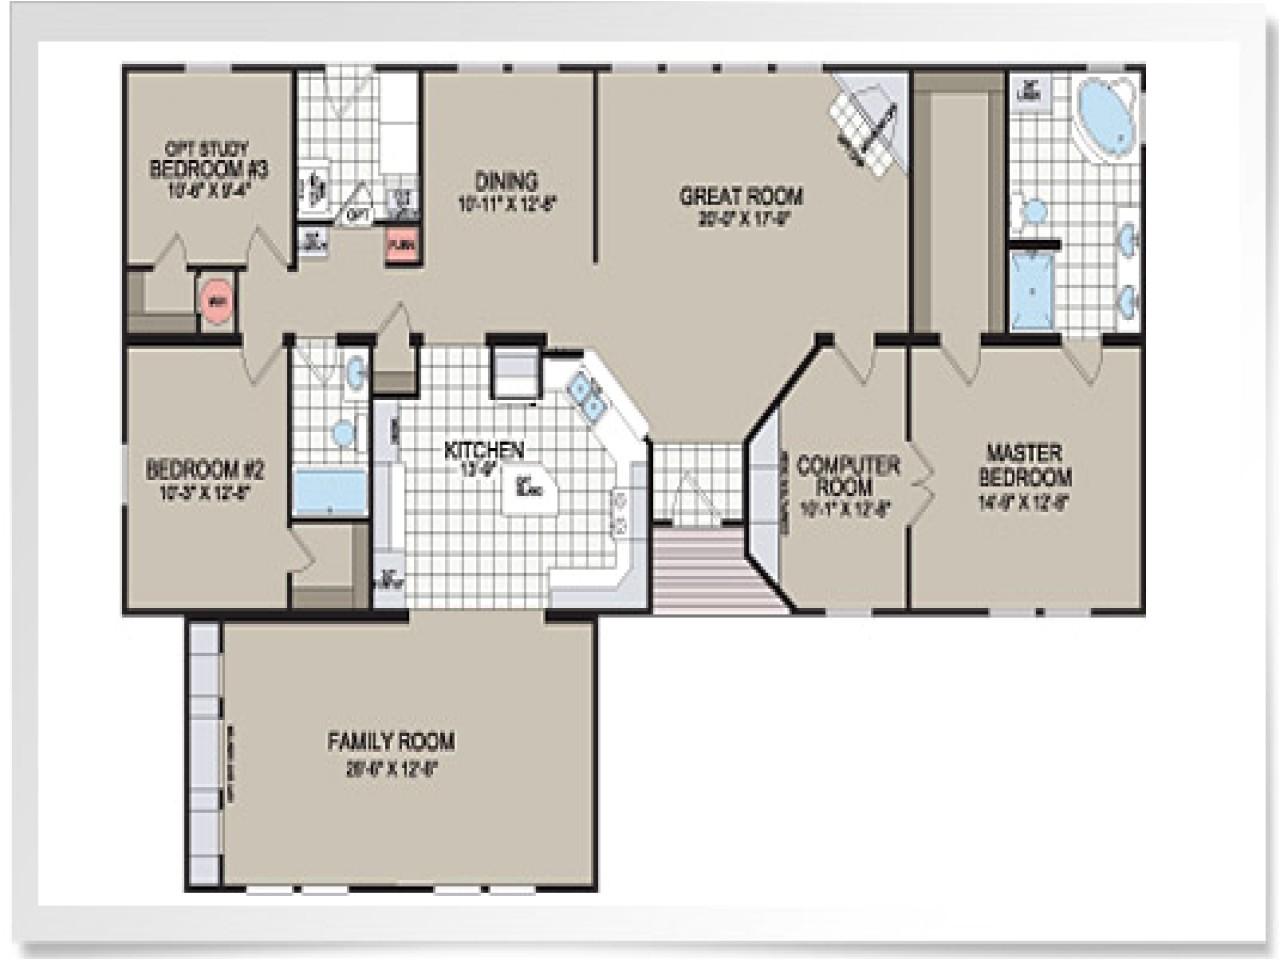 Homes and Floor Plans Modular Homes Floor Plans and Prices Modular Home Floor